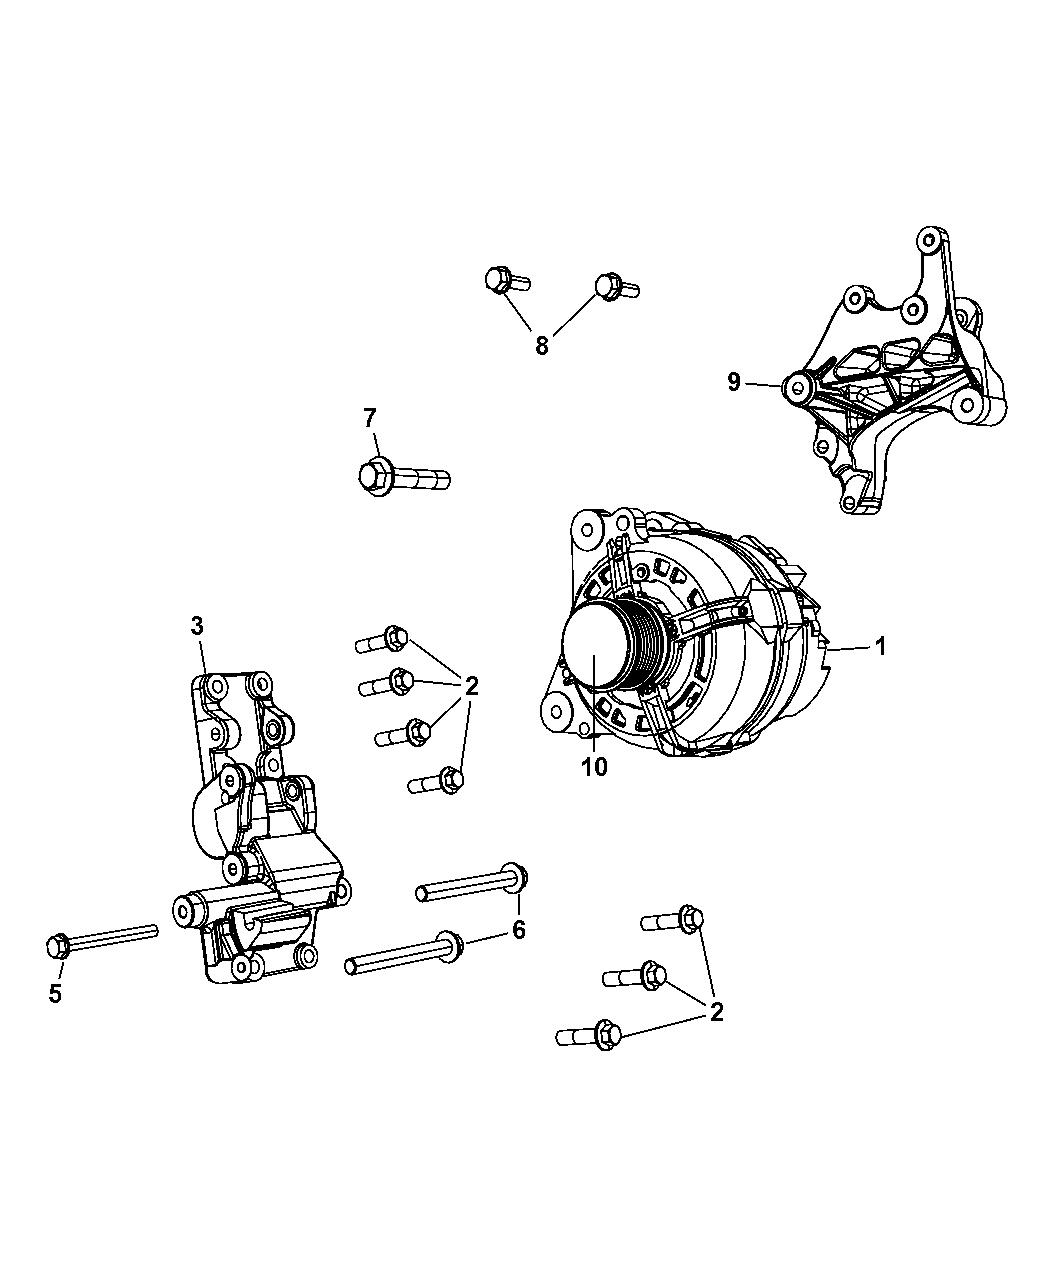 2008 Jeep Patriot Generator Alternator And Related Parts Wiring Diagram Sensors Thumbnail 1